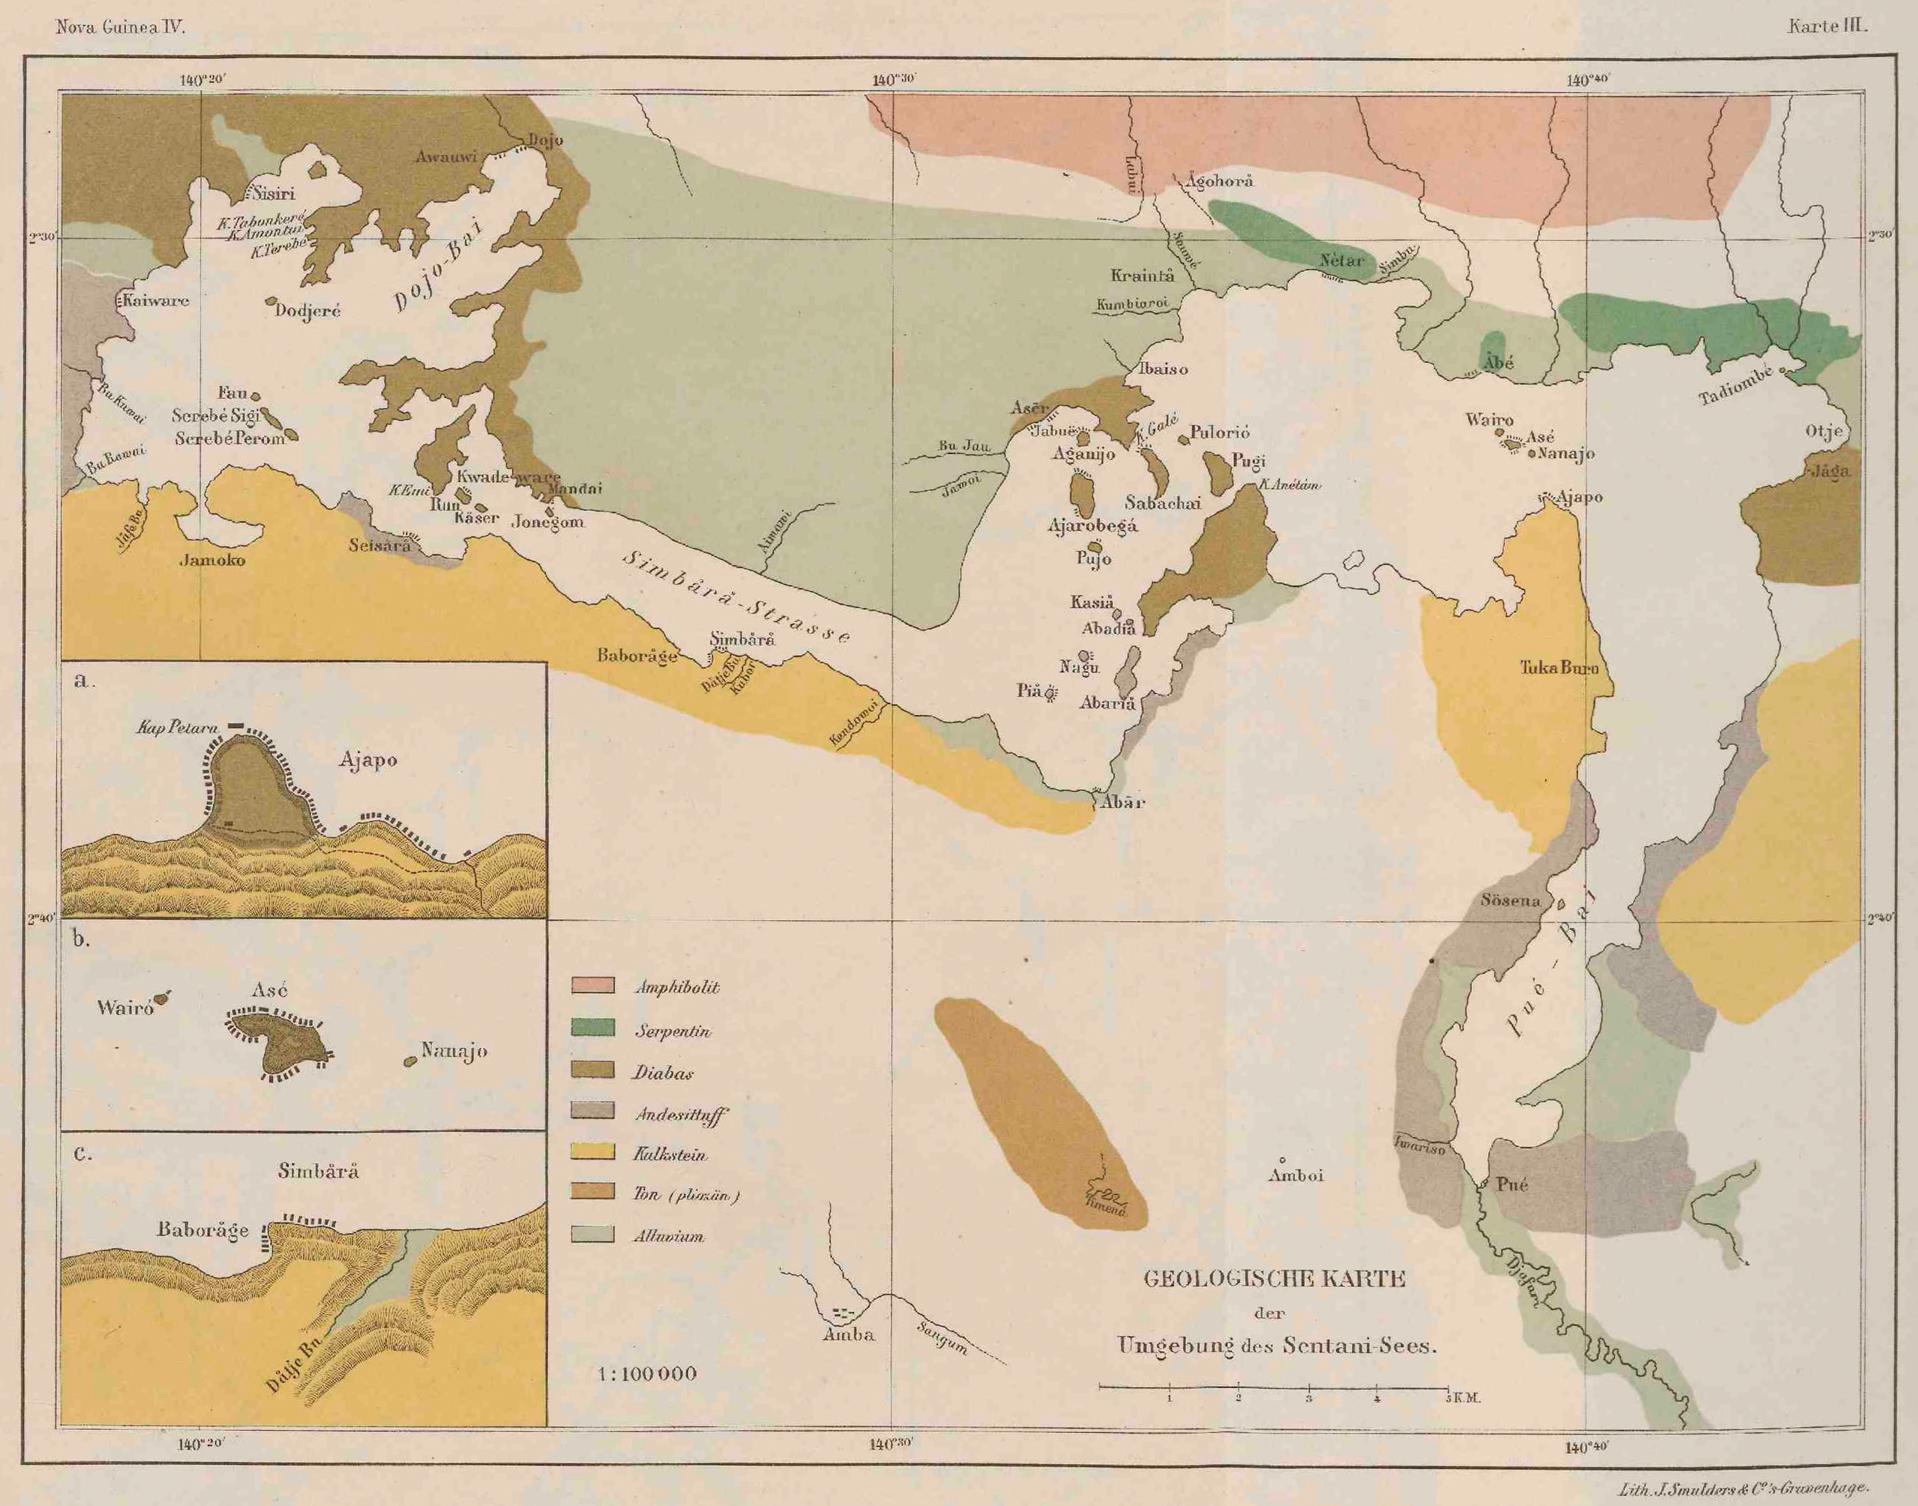 ub utrecht - nova guinea vol 4 - karte 3 - geologische karte der umgebung des sentani-sees.jpg